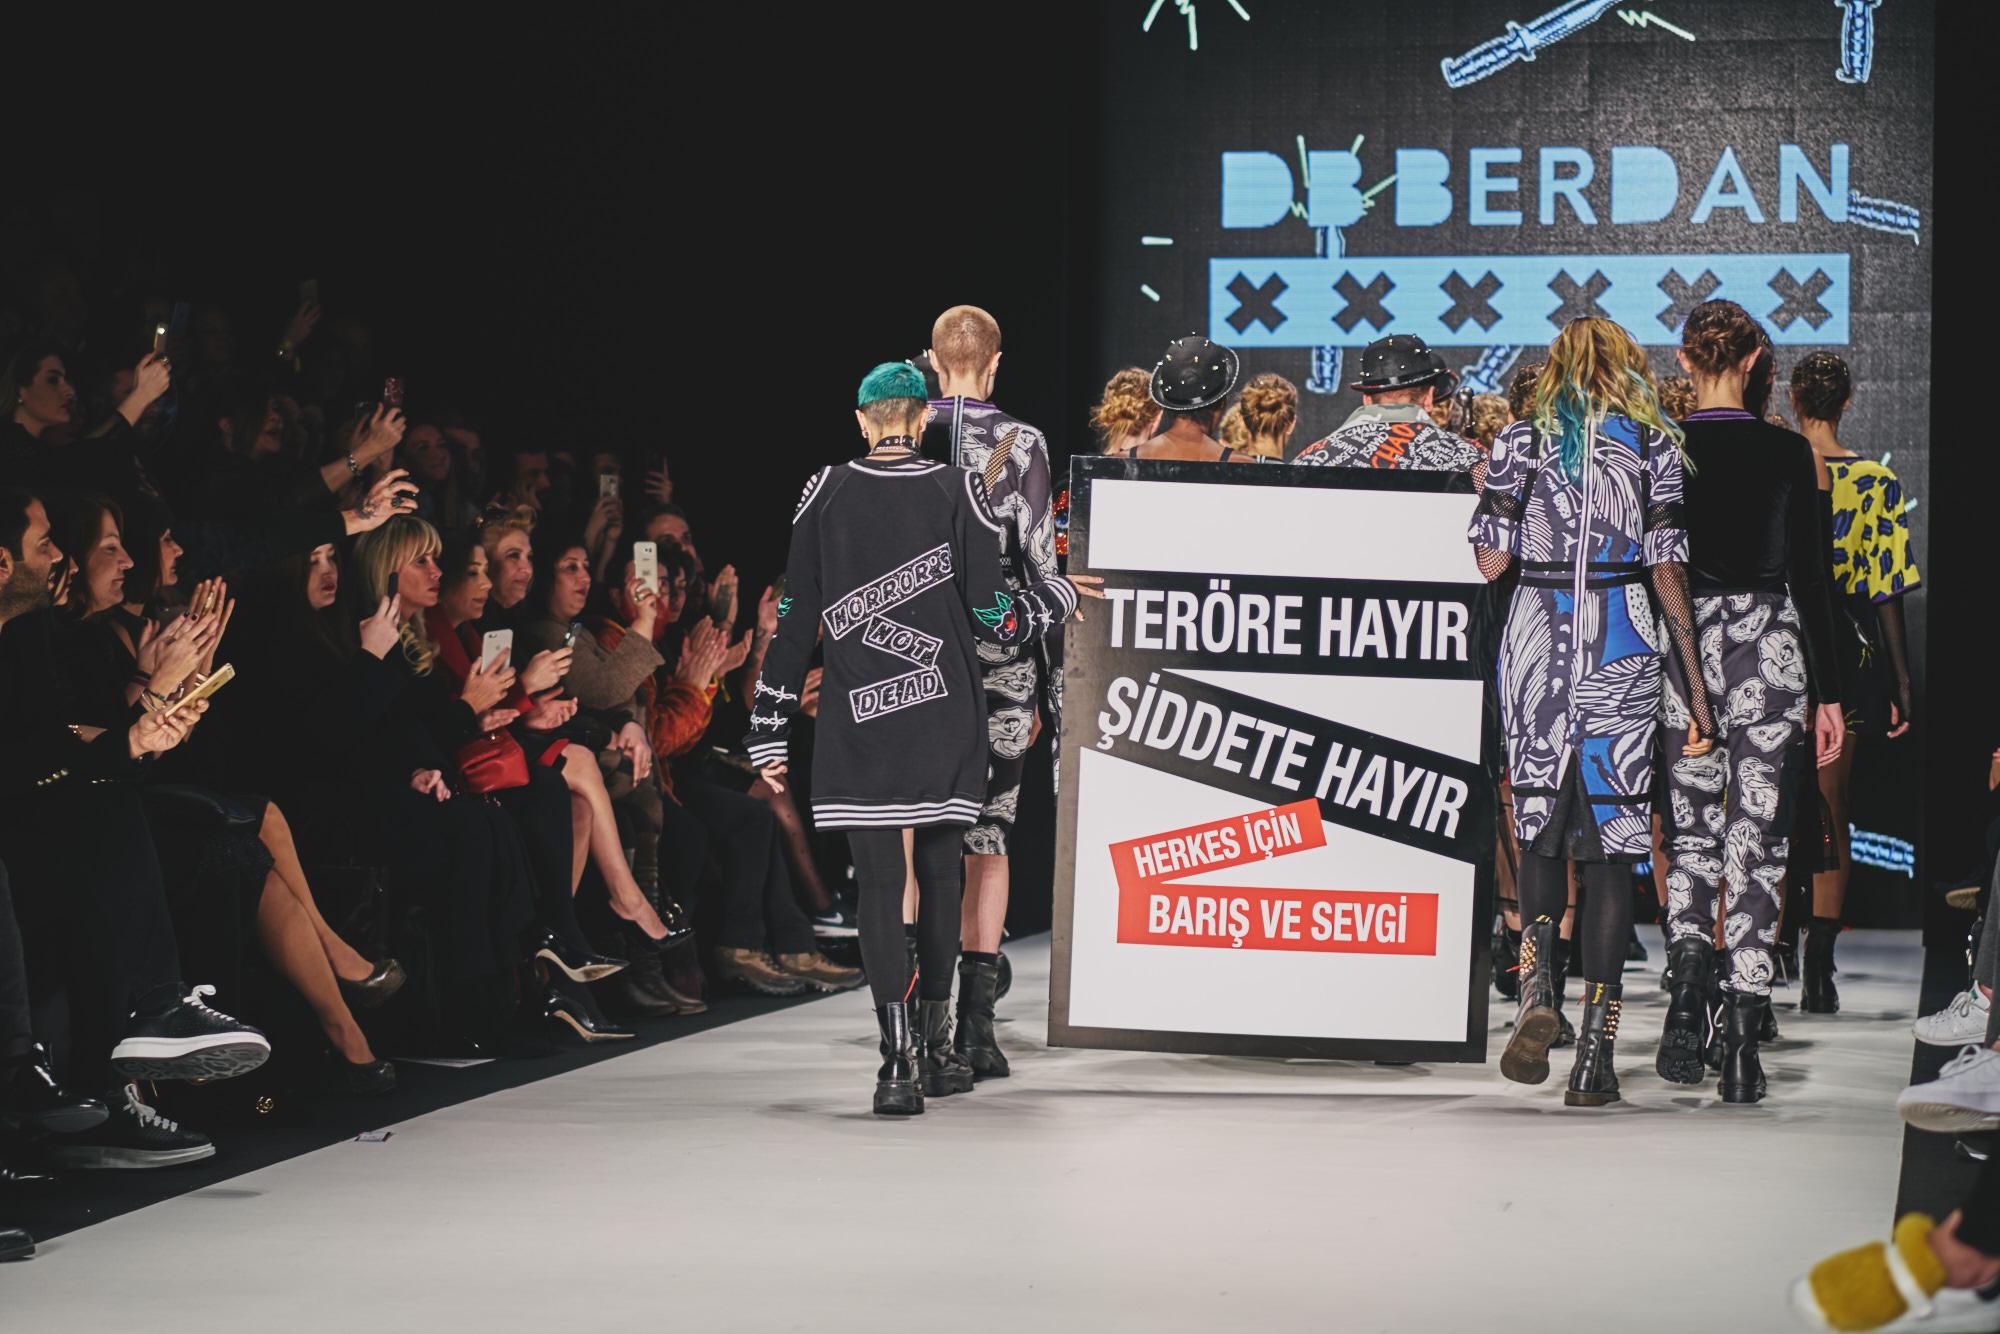 billur saatci, street style, mbfwi, off ne giysem, turkish style blogger, mercedes benz fashion week istanbul, deniz berdan, db berdan,